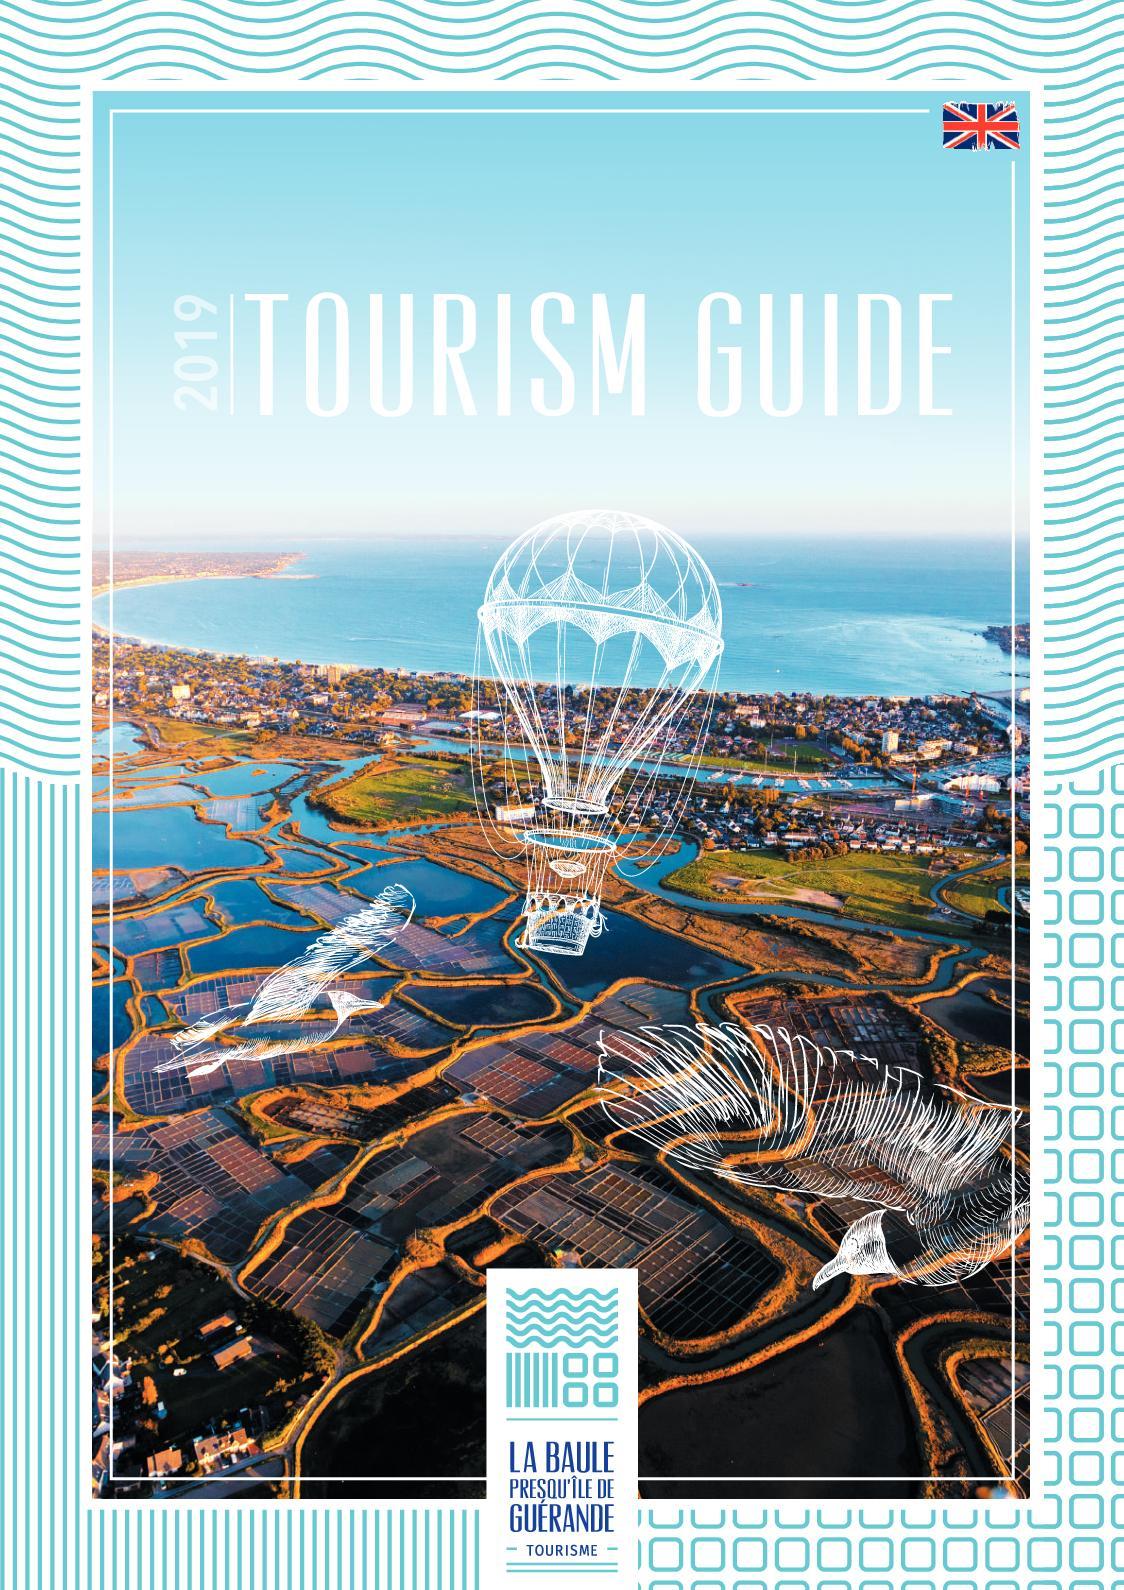 Salon Jardin Intermarche Nouveau Calaméo Guide touristique 2019 Anglais Of 20 Best Of Salon Jardin Intermarche